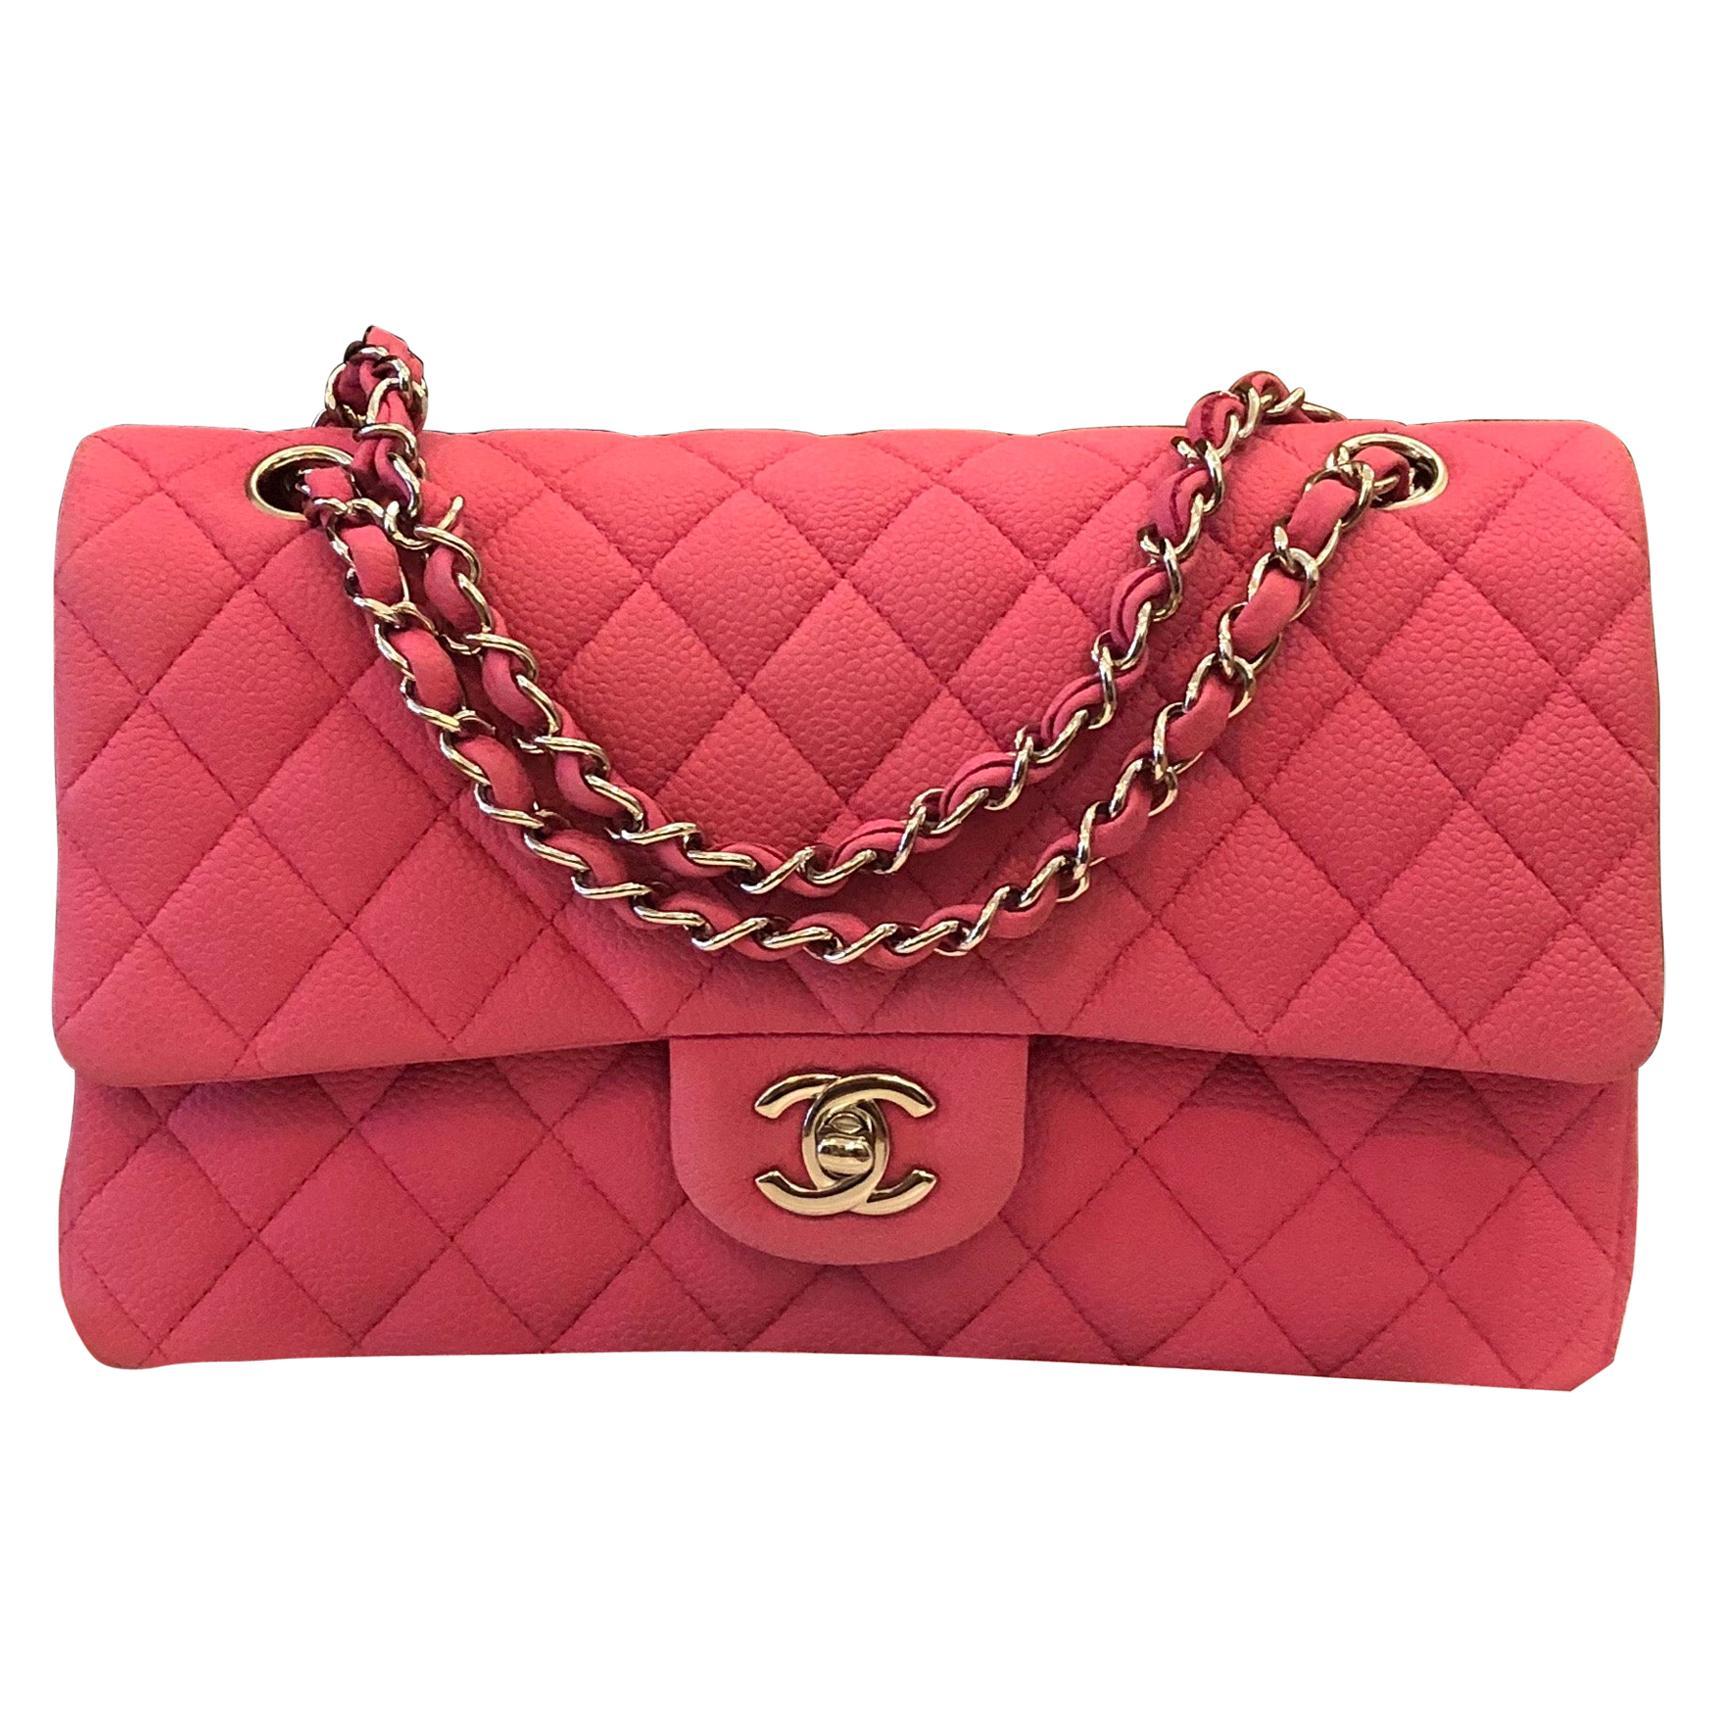 Chanel Pink Caviar Nubuck Classic Double Flap Bag